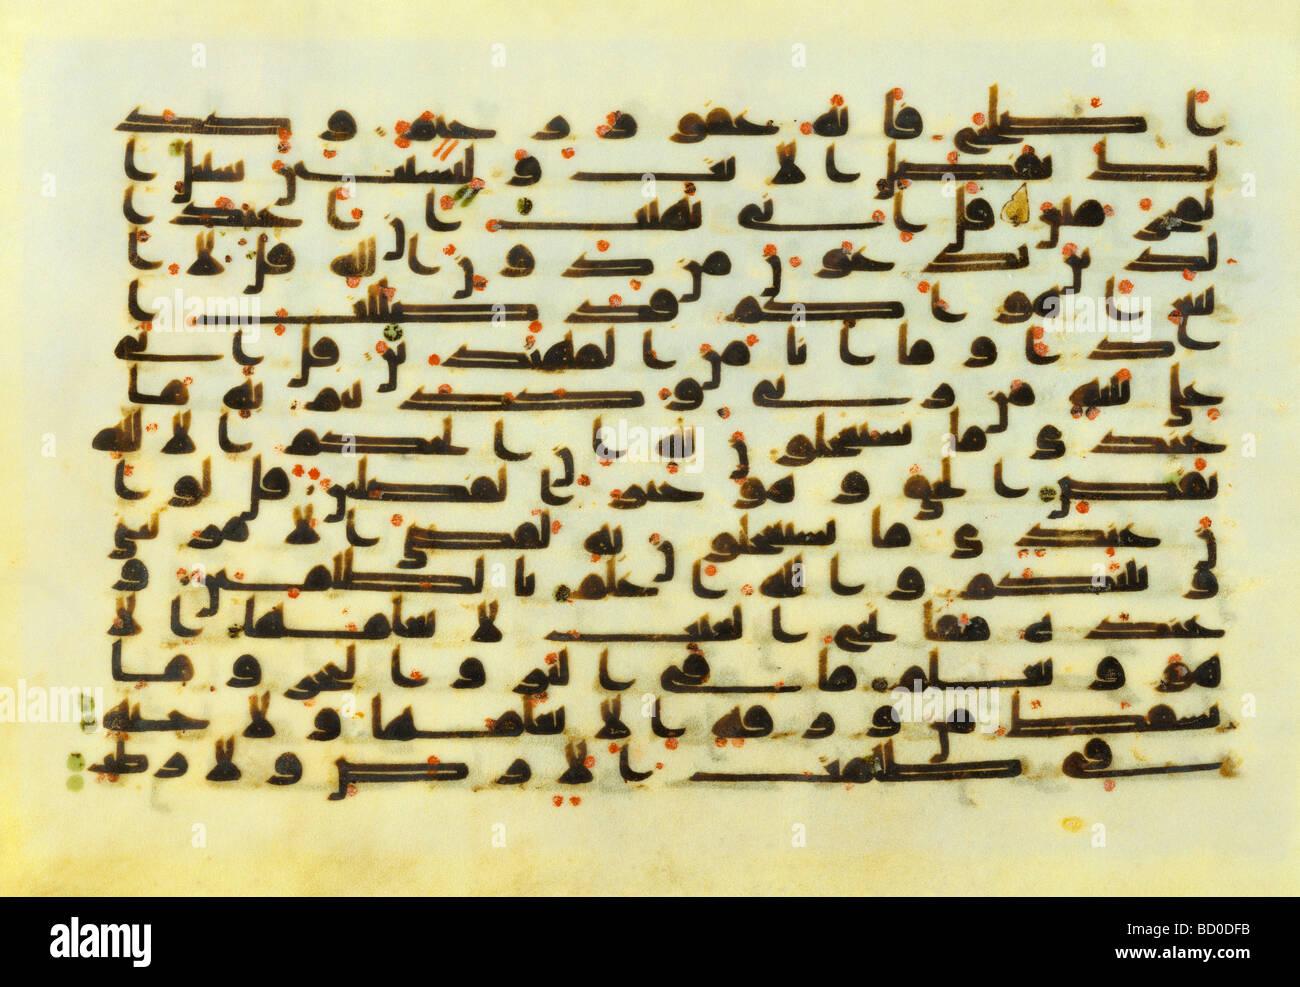 The Koran. Iraq, 8th-9th century - Stock Image